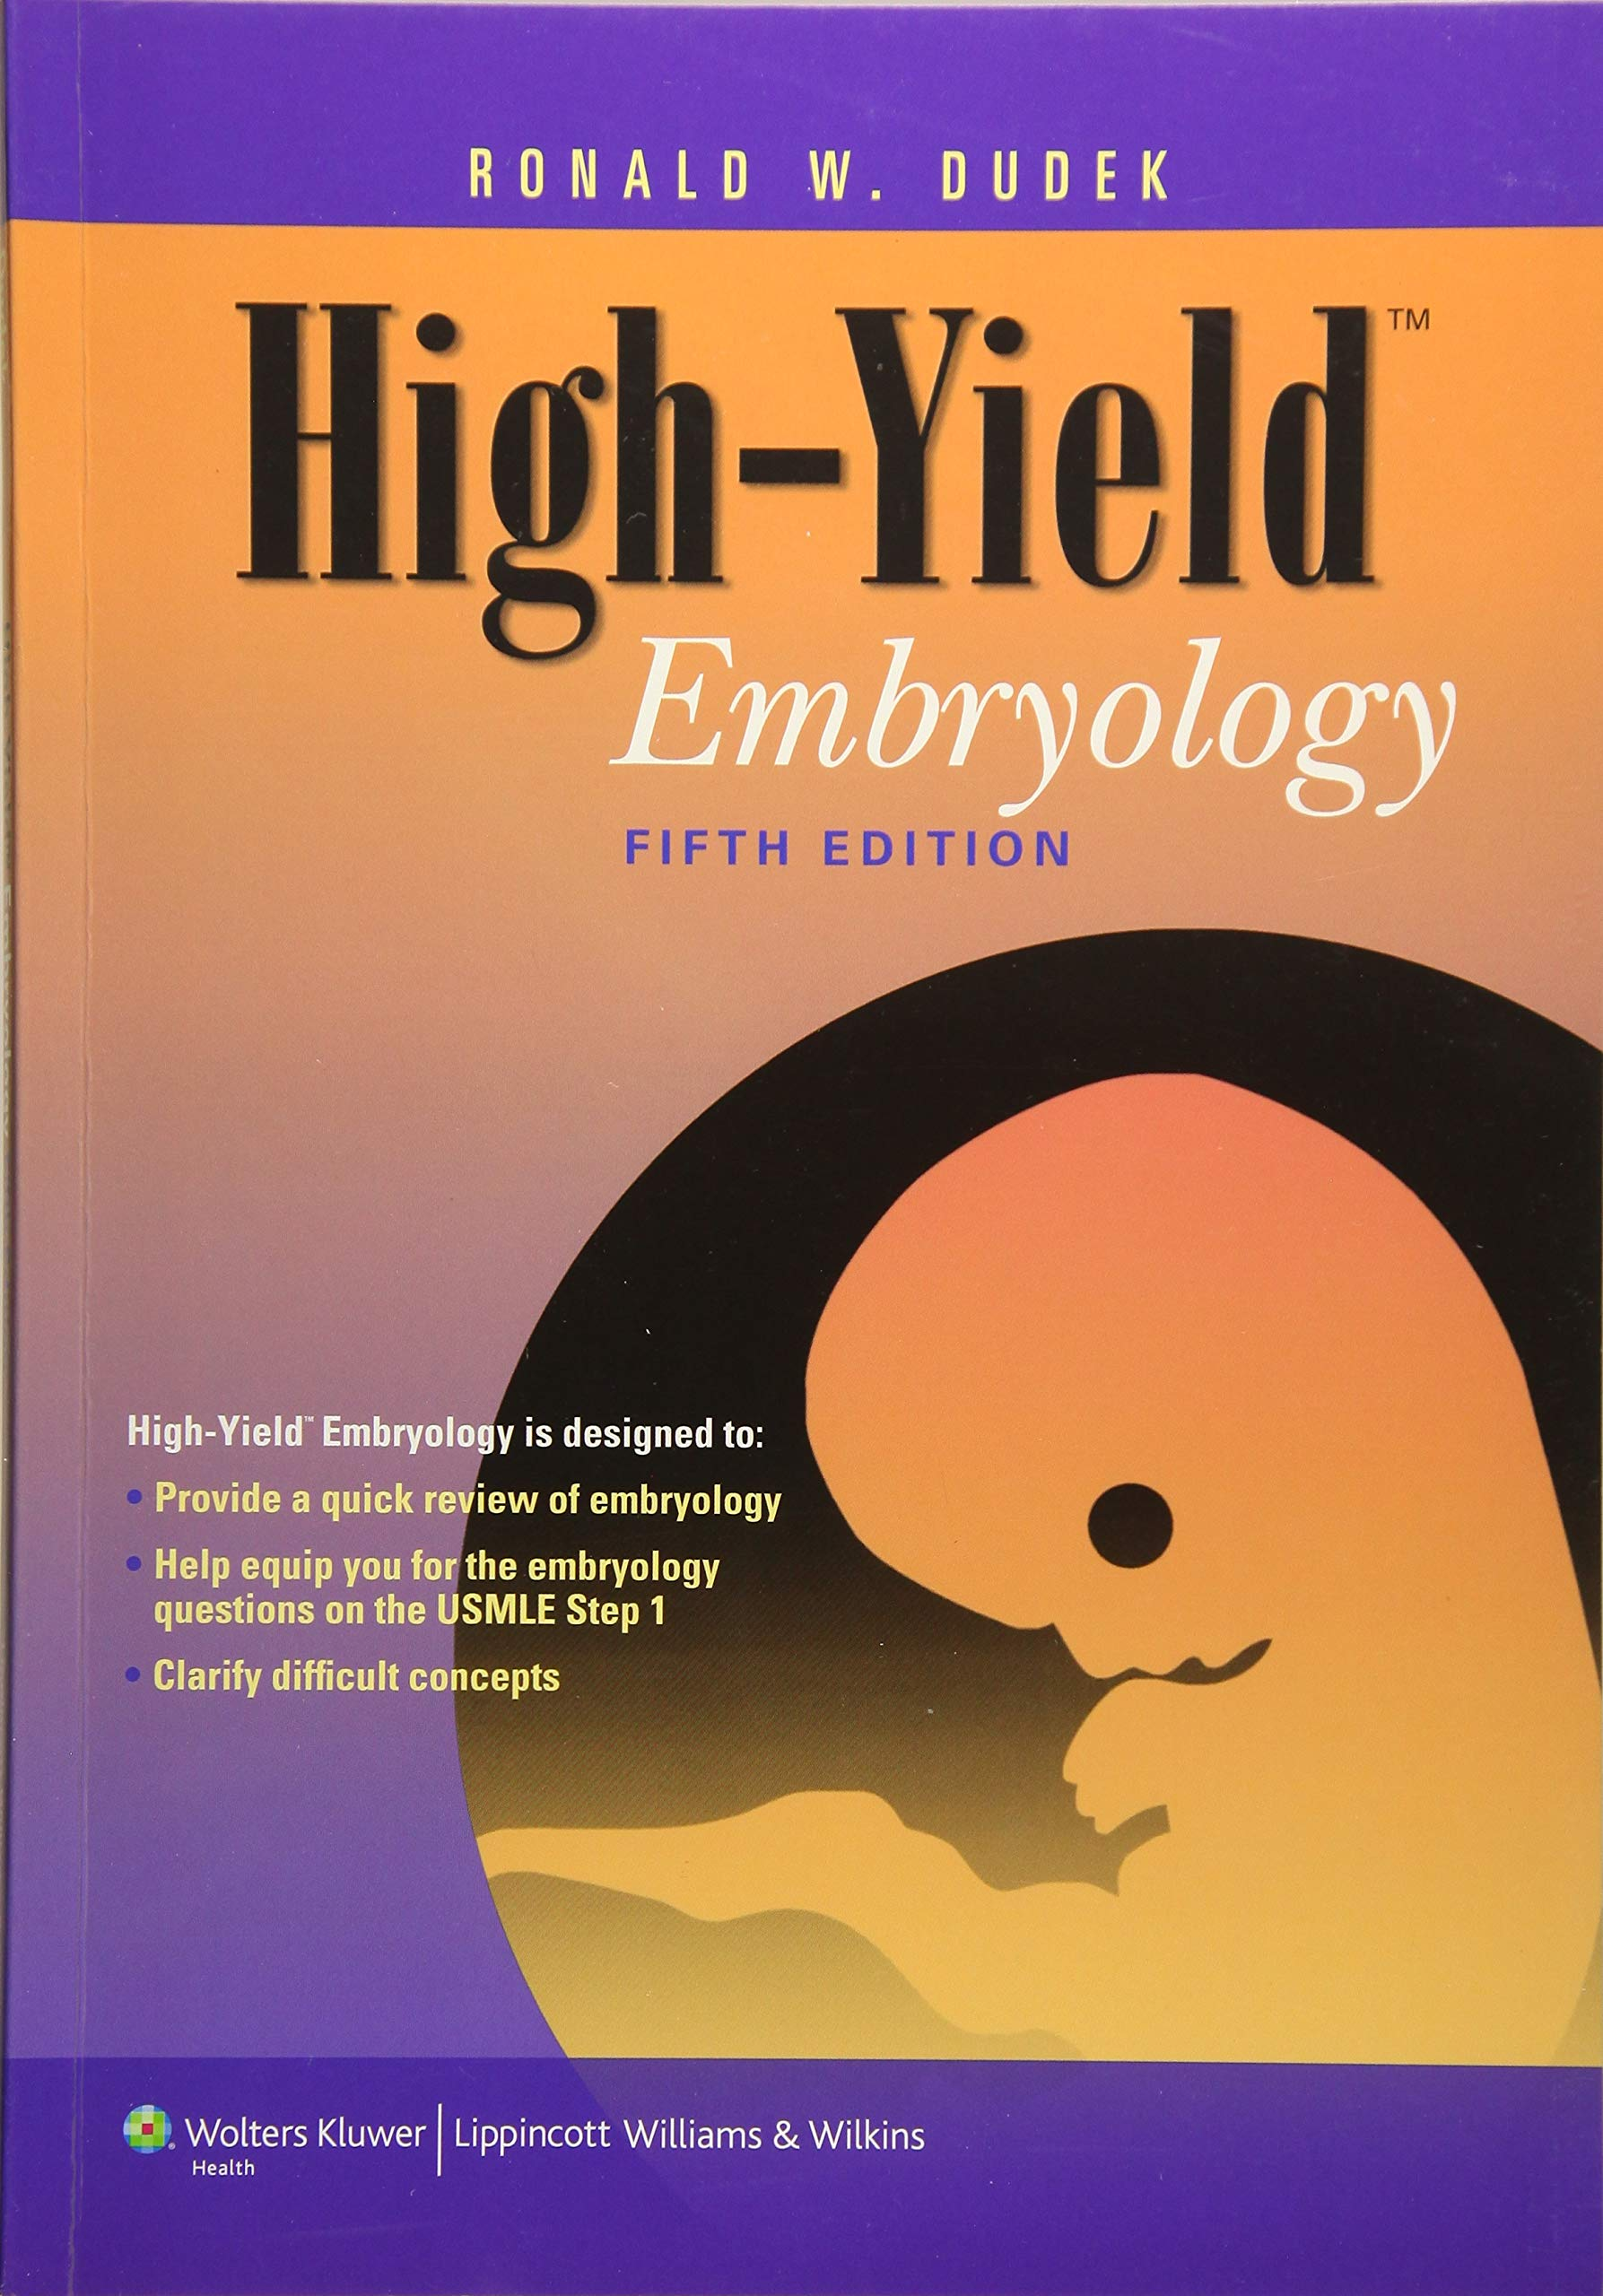 High-Yield Embryology: Dr Ronald W Dudek PhD: Amazon.com.mx: Libros